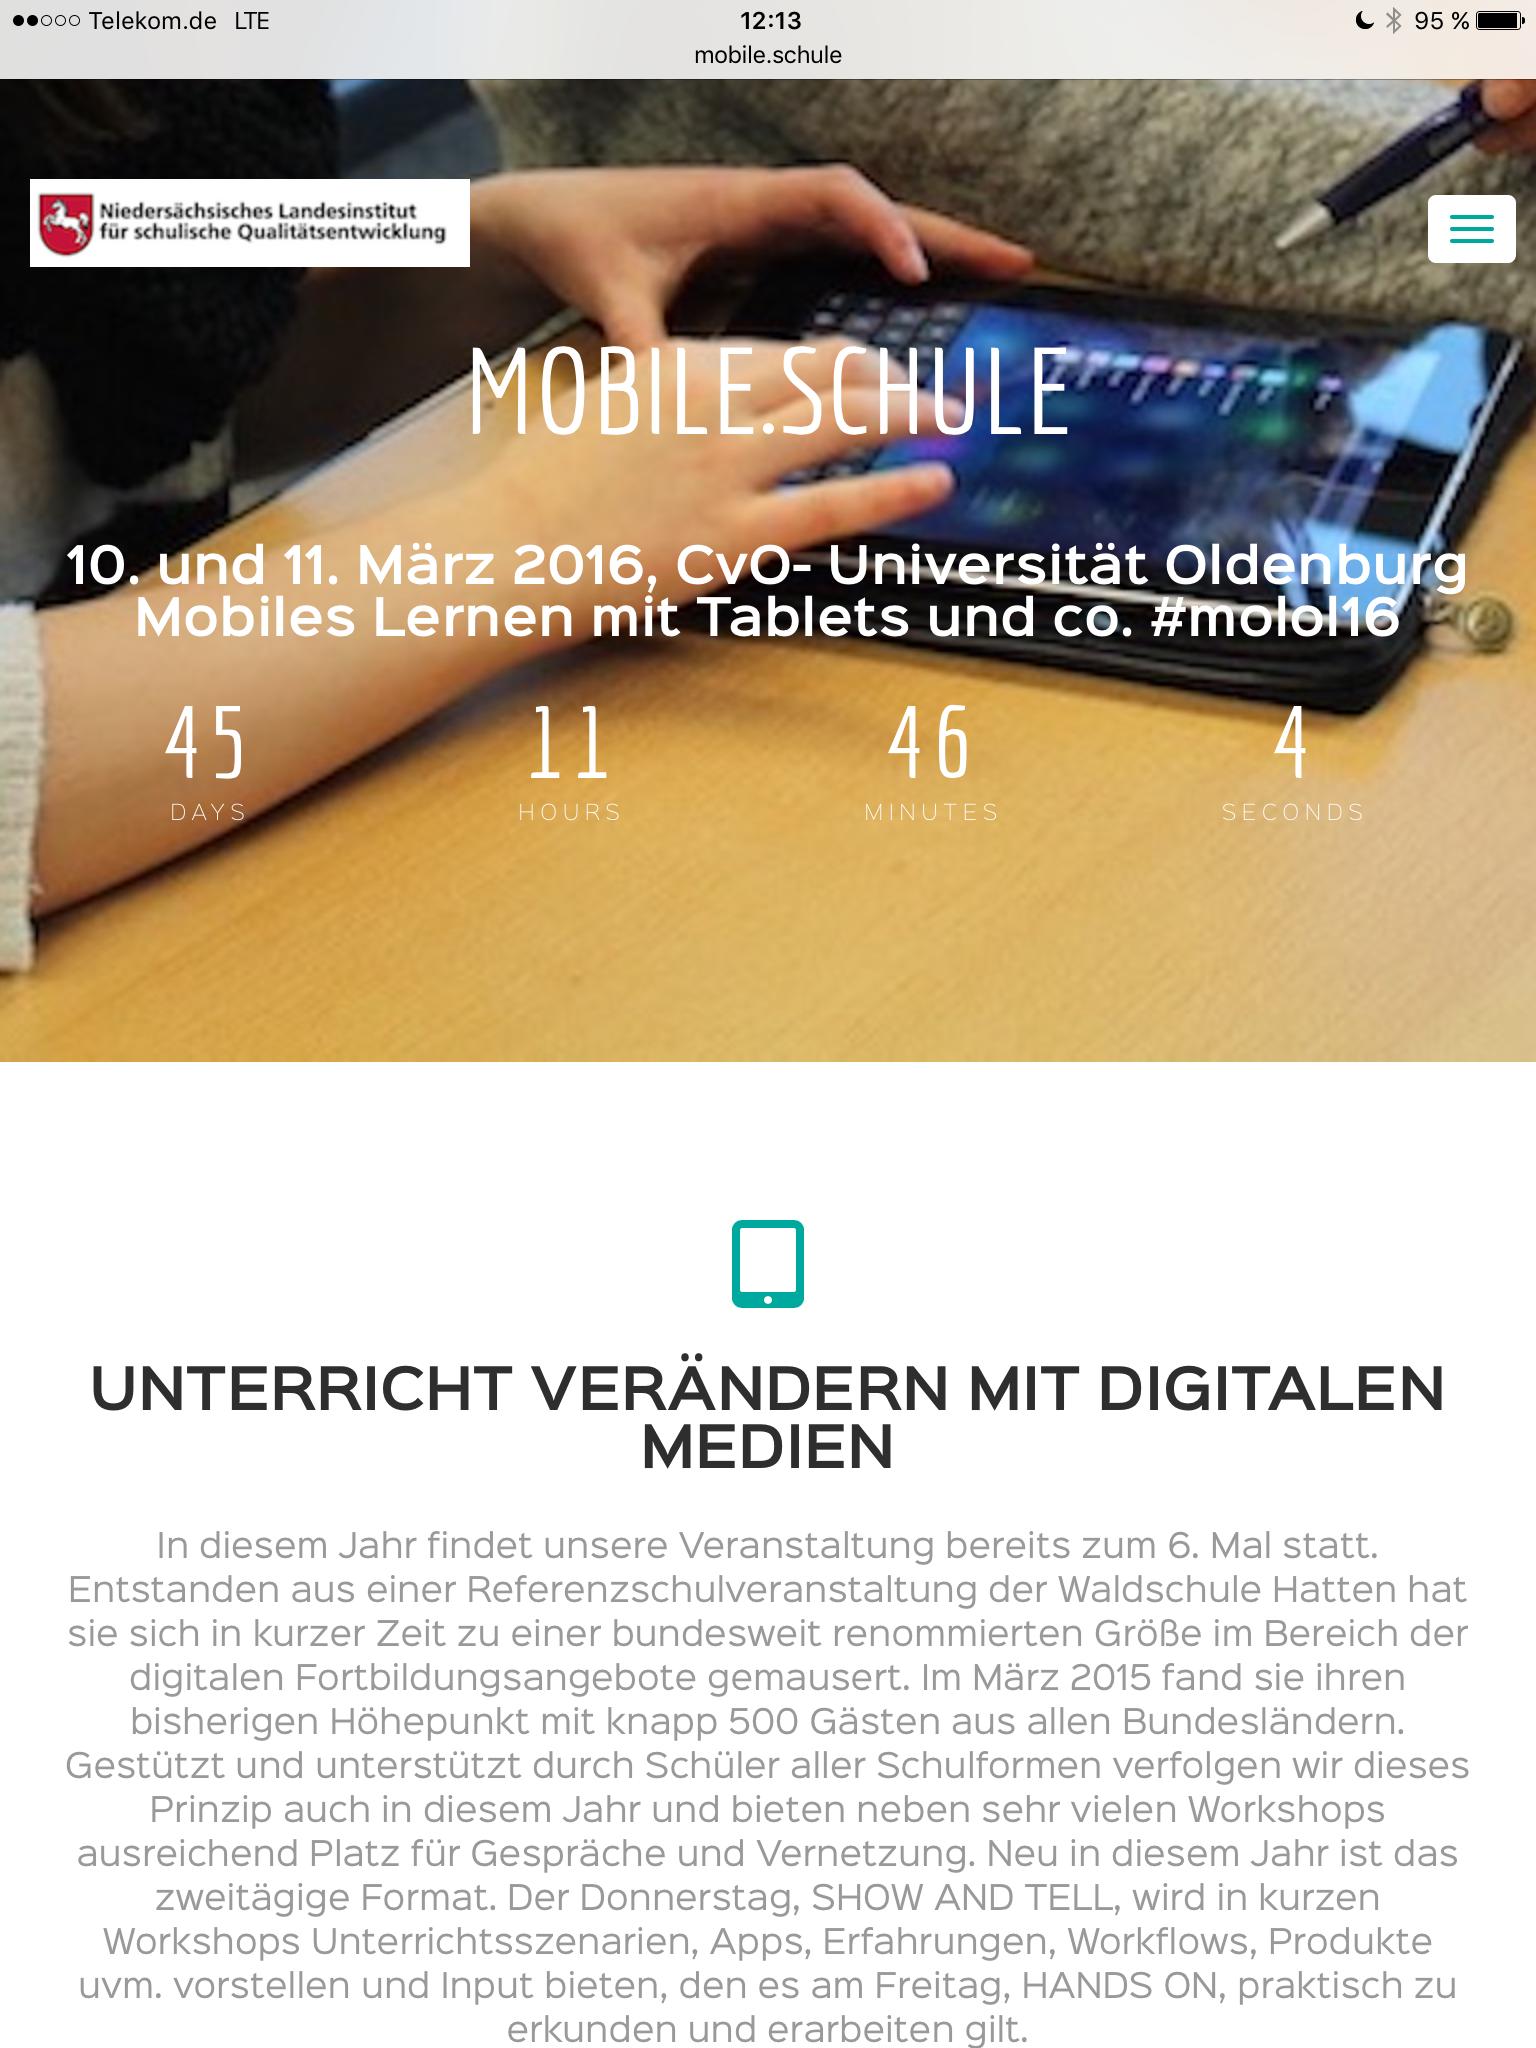 Mobile Schule 2016 in Oldenburg